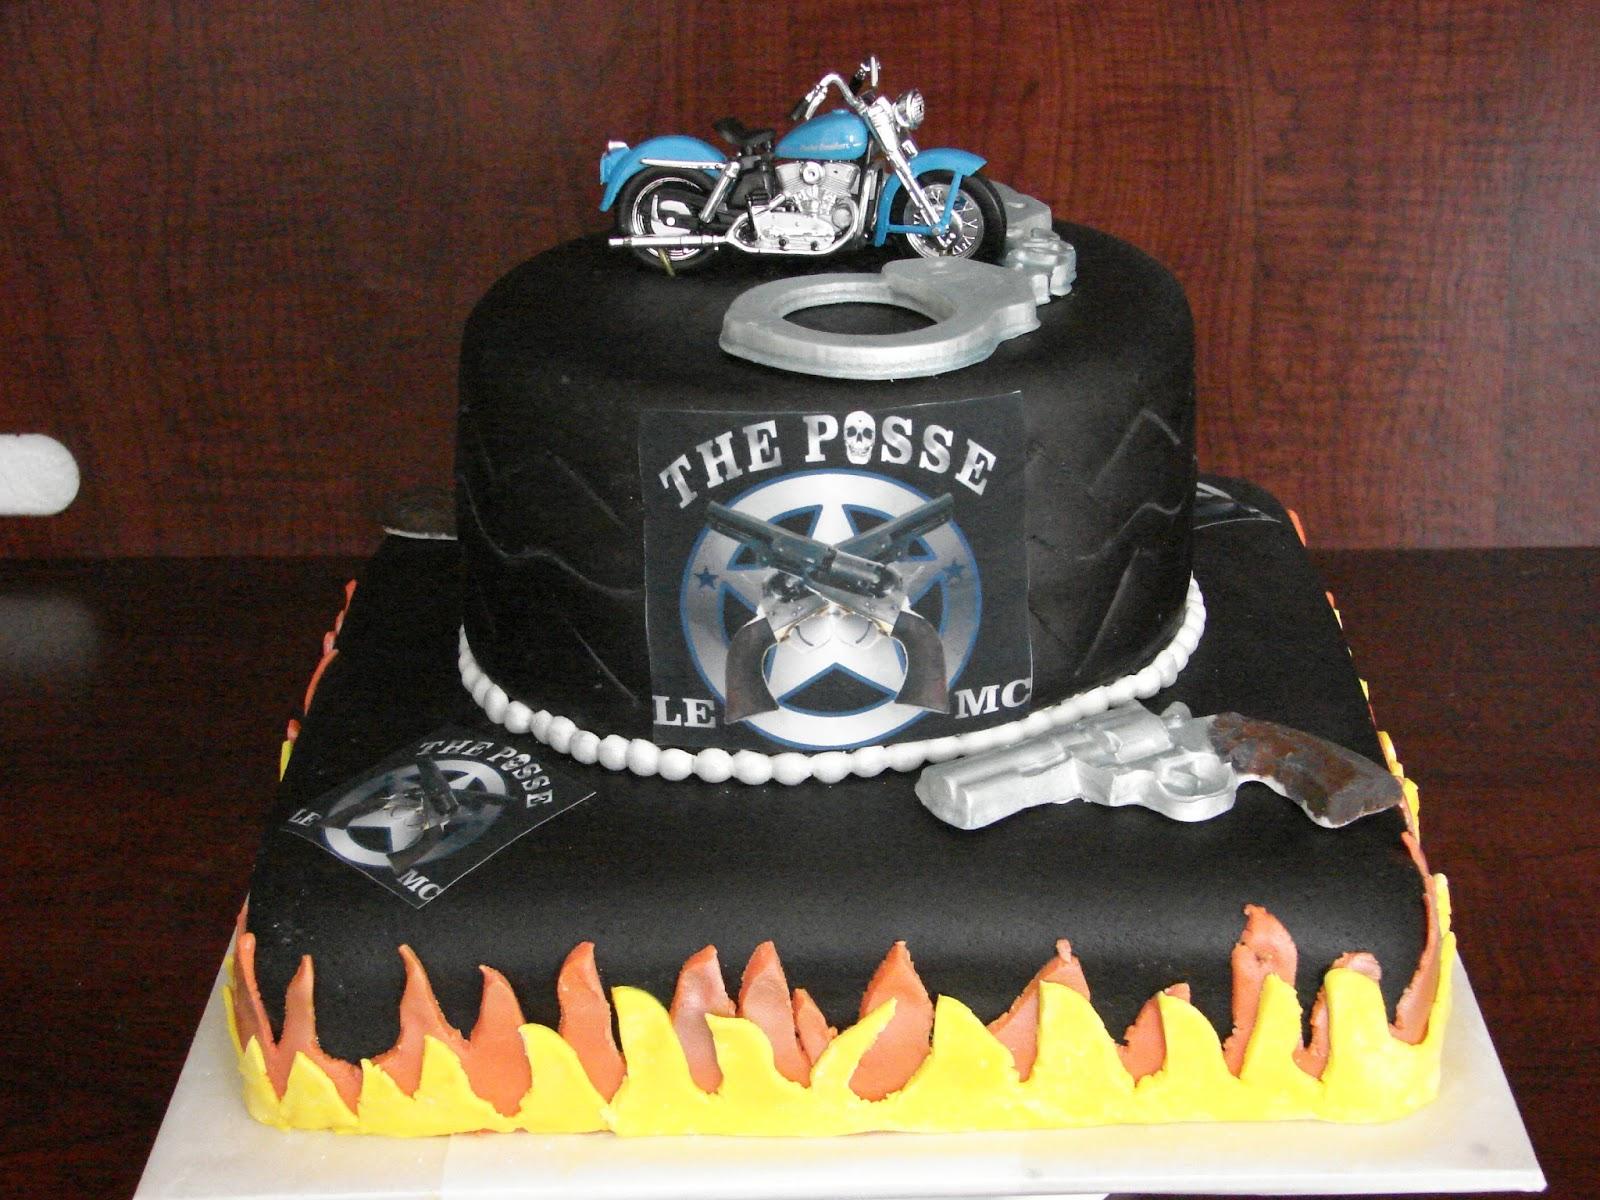 My Cake Hobby: Motorcycle Cake